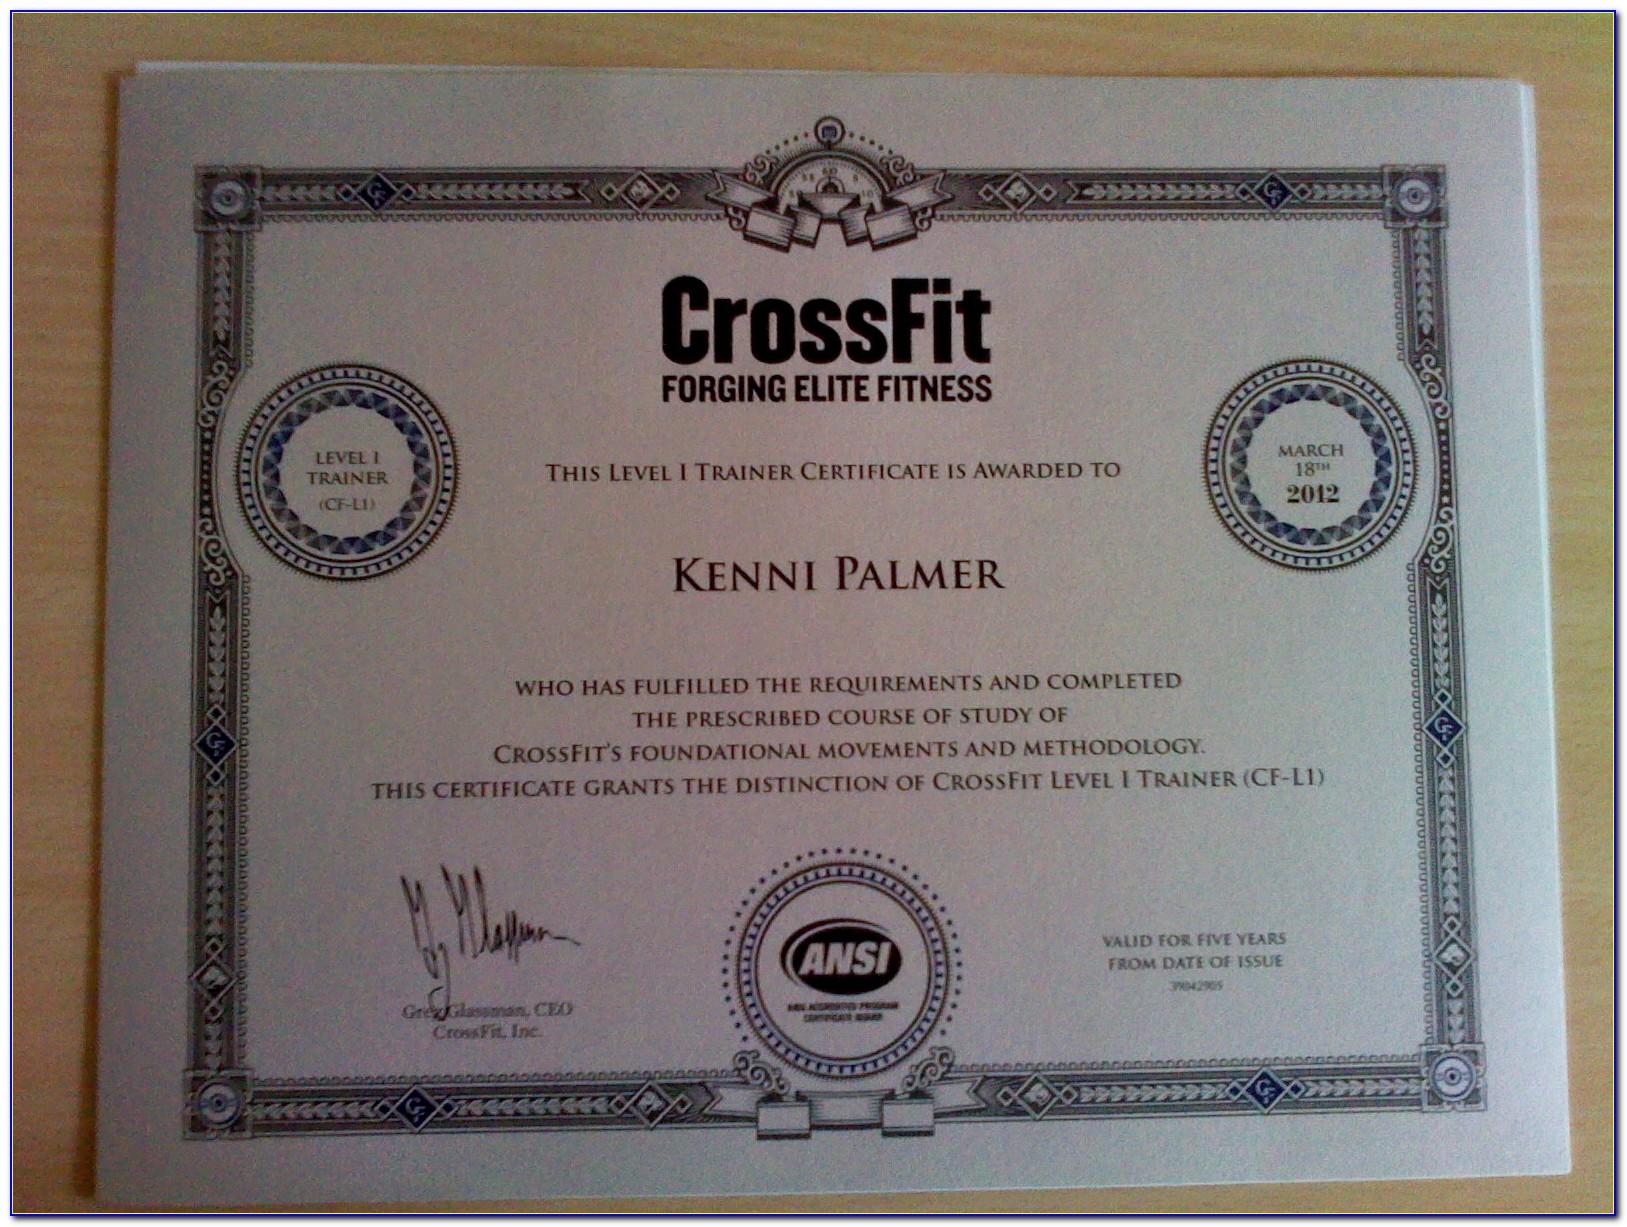 Crossfit Trainer Certification Singapore